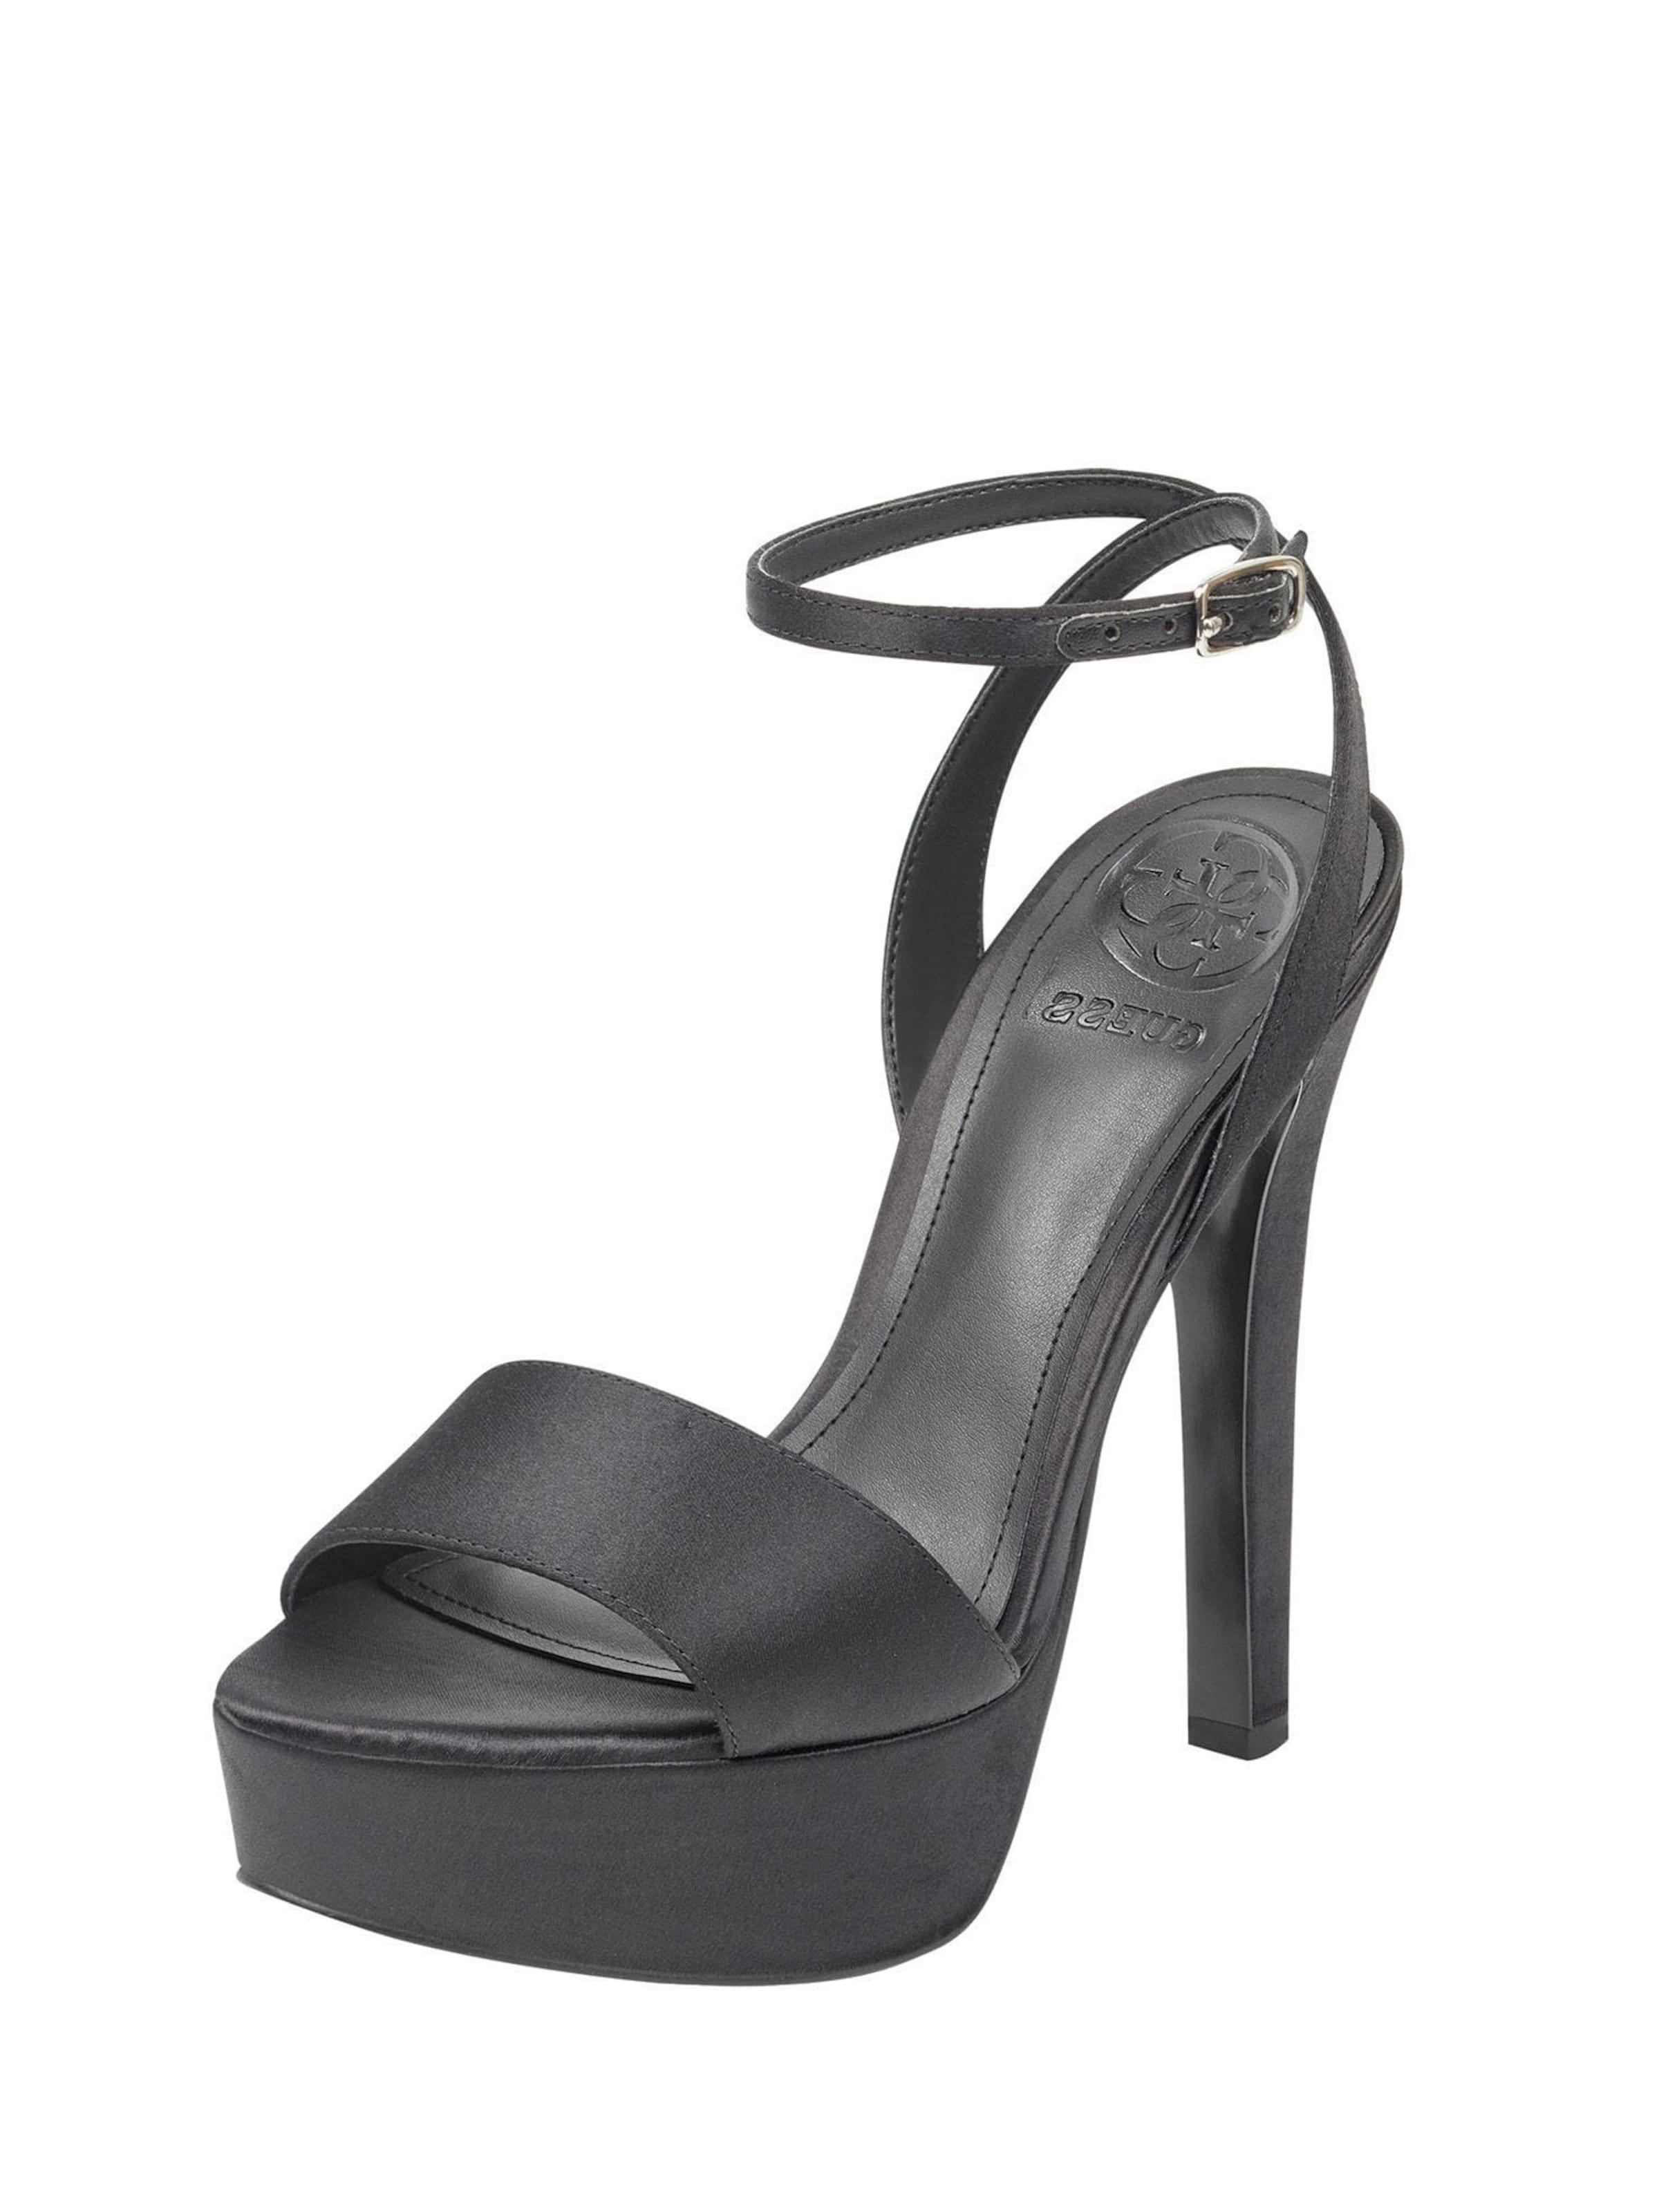 GUESS SANDALETTE EMPRESS Verschleißfeste billige Schuhe